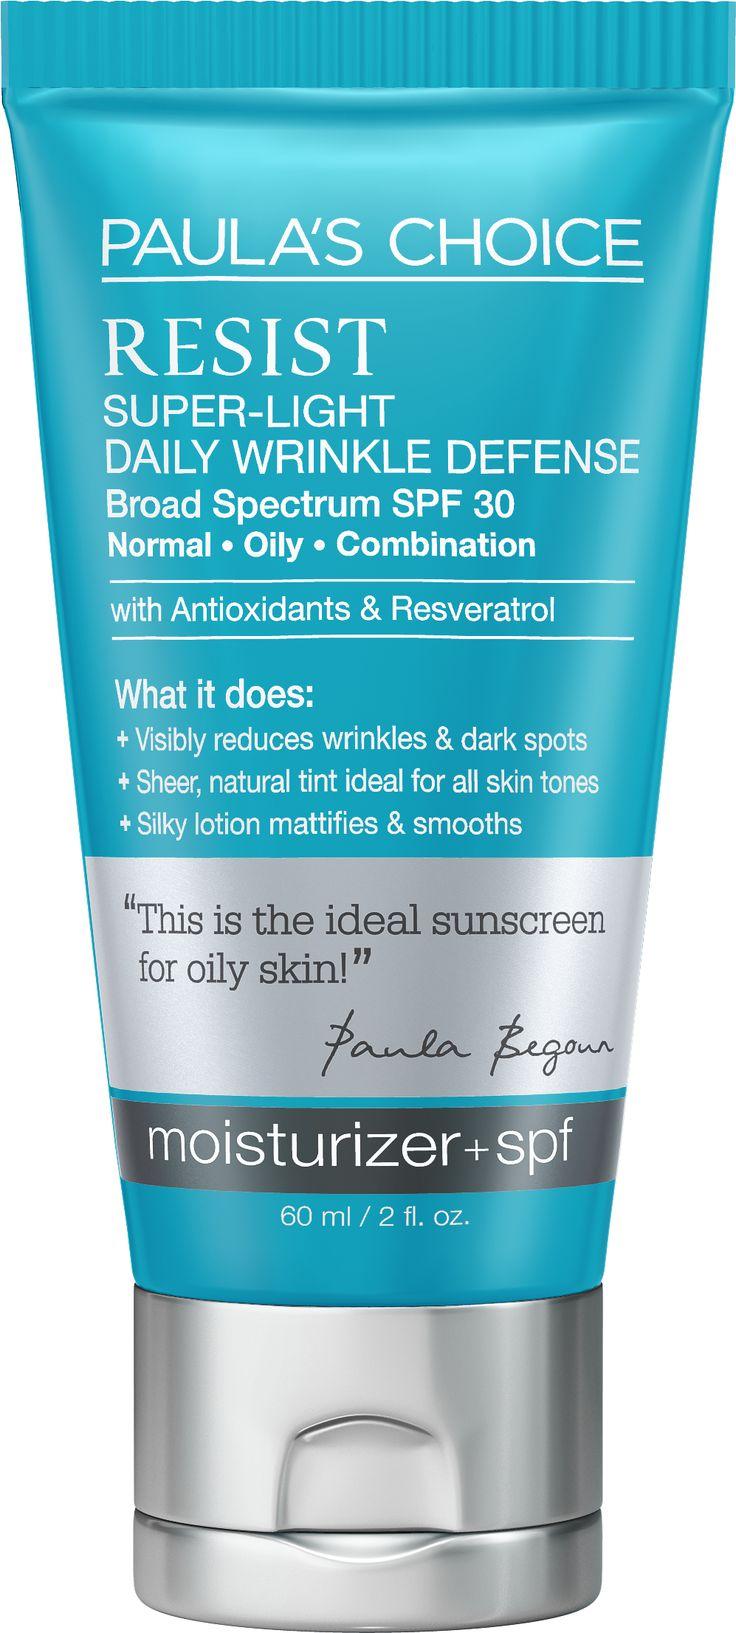 RESIST Super-Light Daily Wrinkle Defense SPF 30 60 ml Paula's Choice